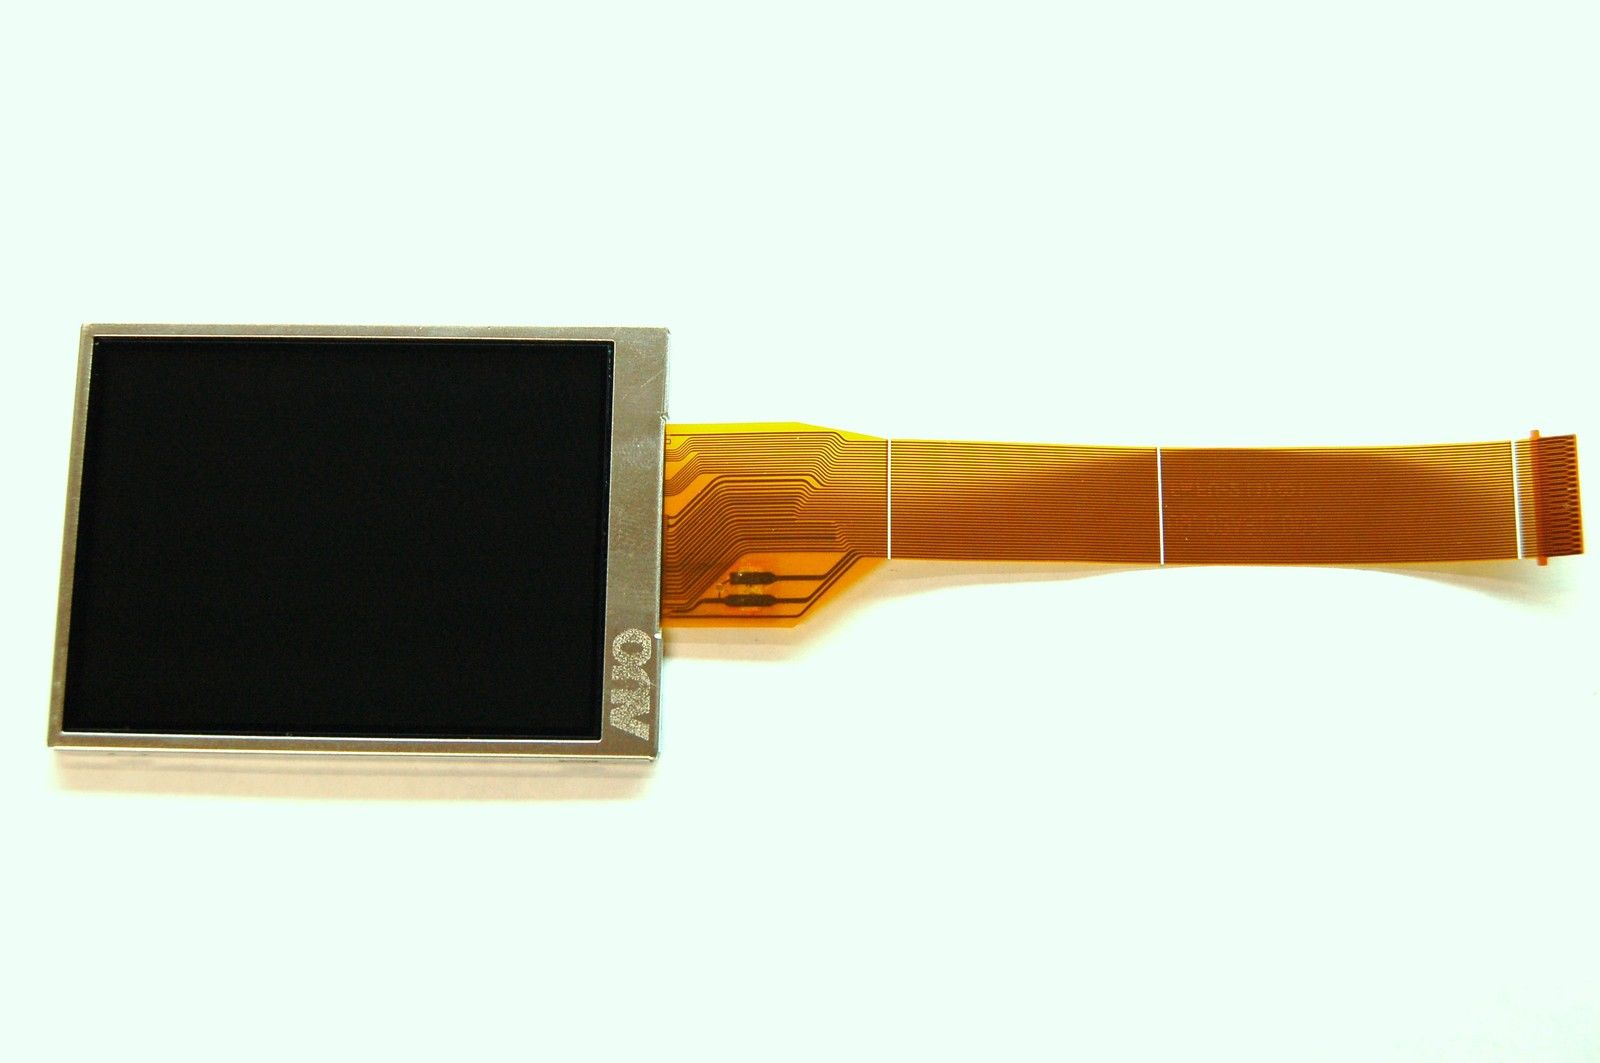 Fujifilm Finepix J10 GE E1035 LCD DISPLAY SCREEN Fuji OEM FD